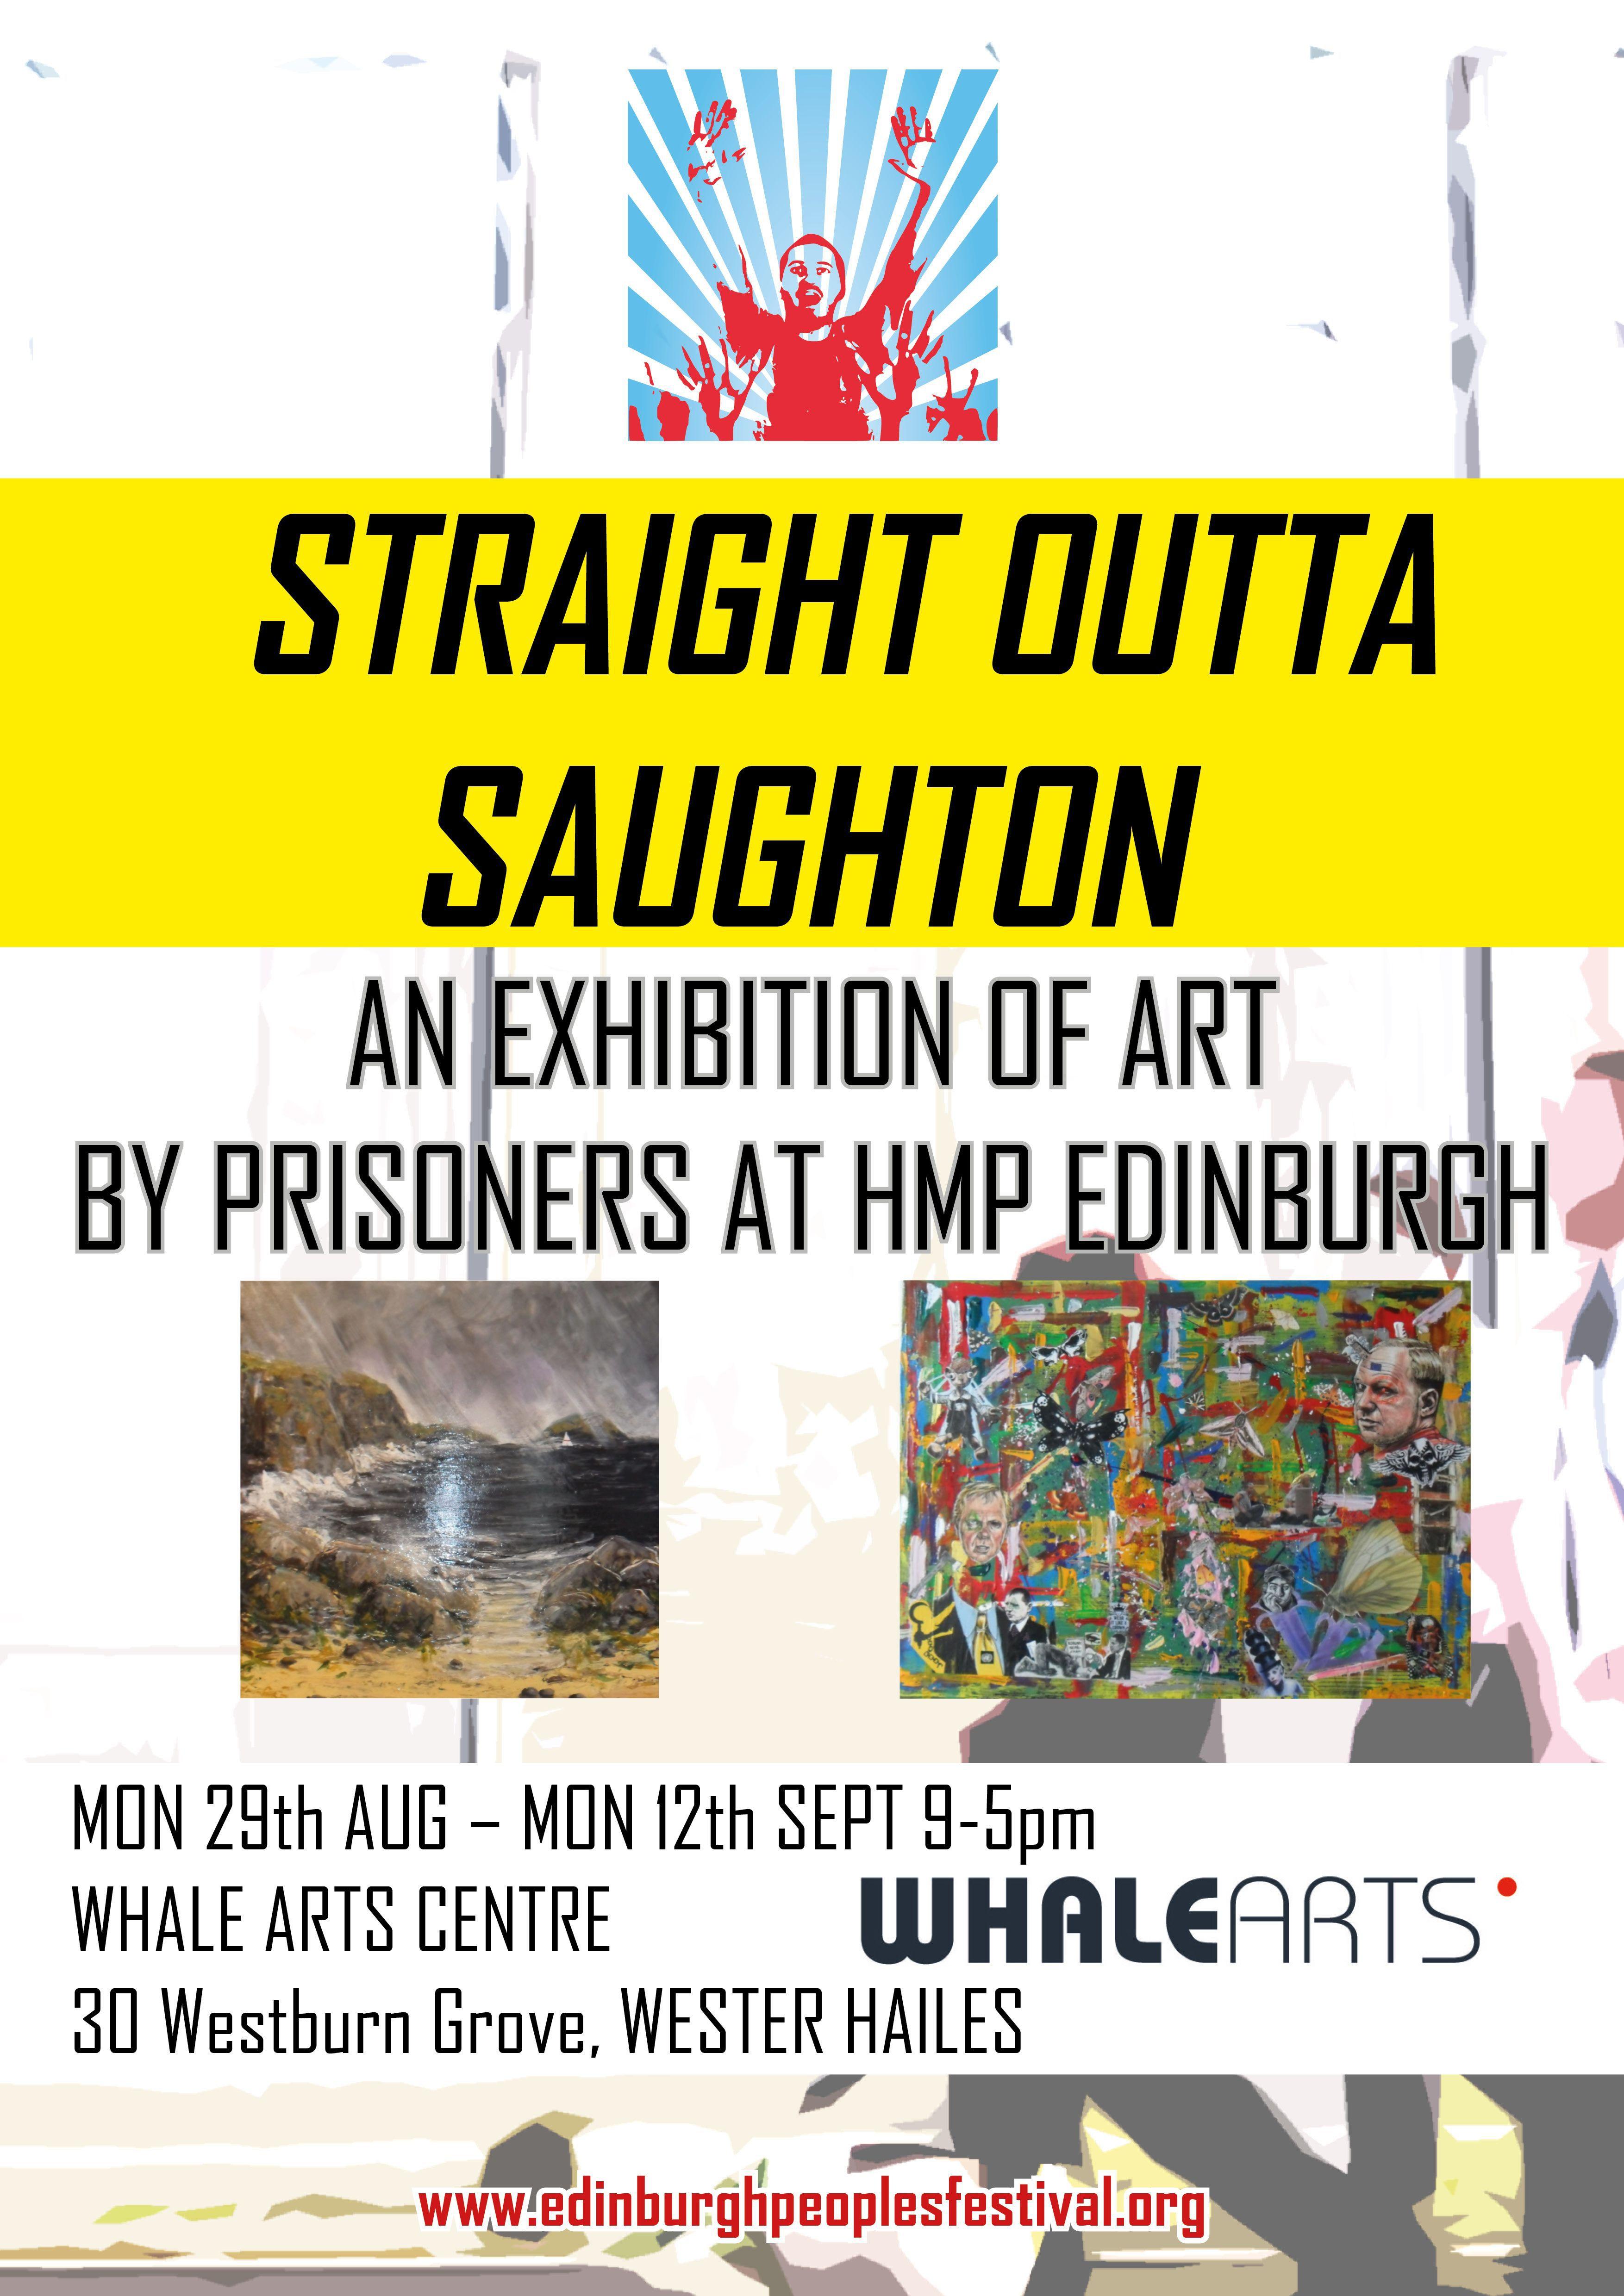 Straight-Outta-Saughton(1)